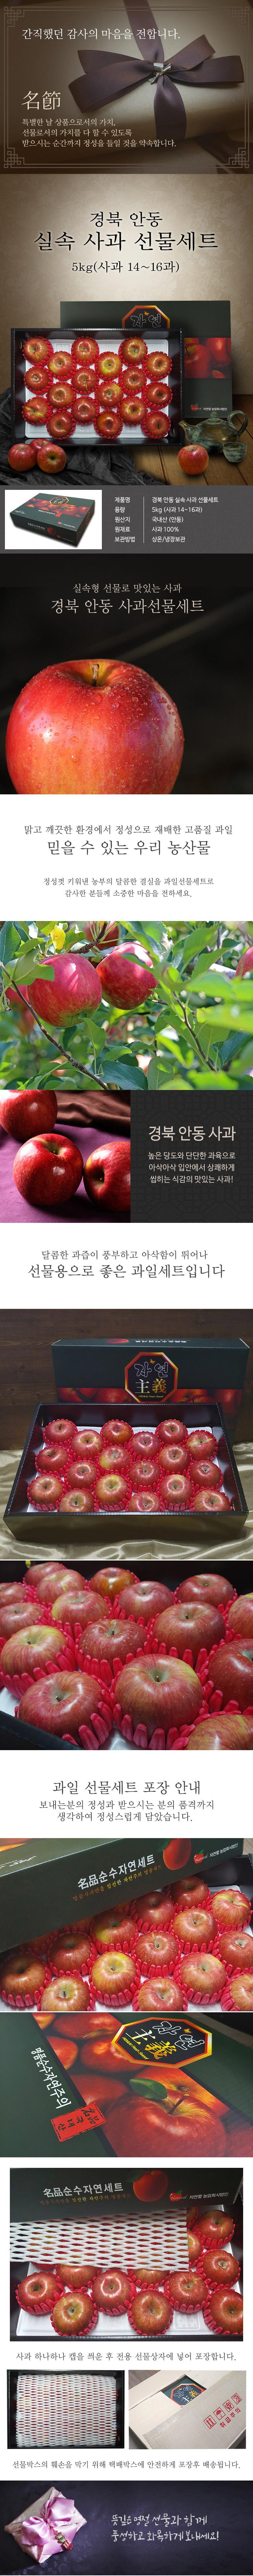 27farm_apple_gift_bad14.jpg